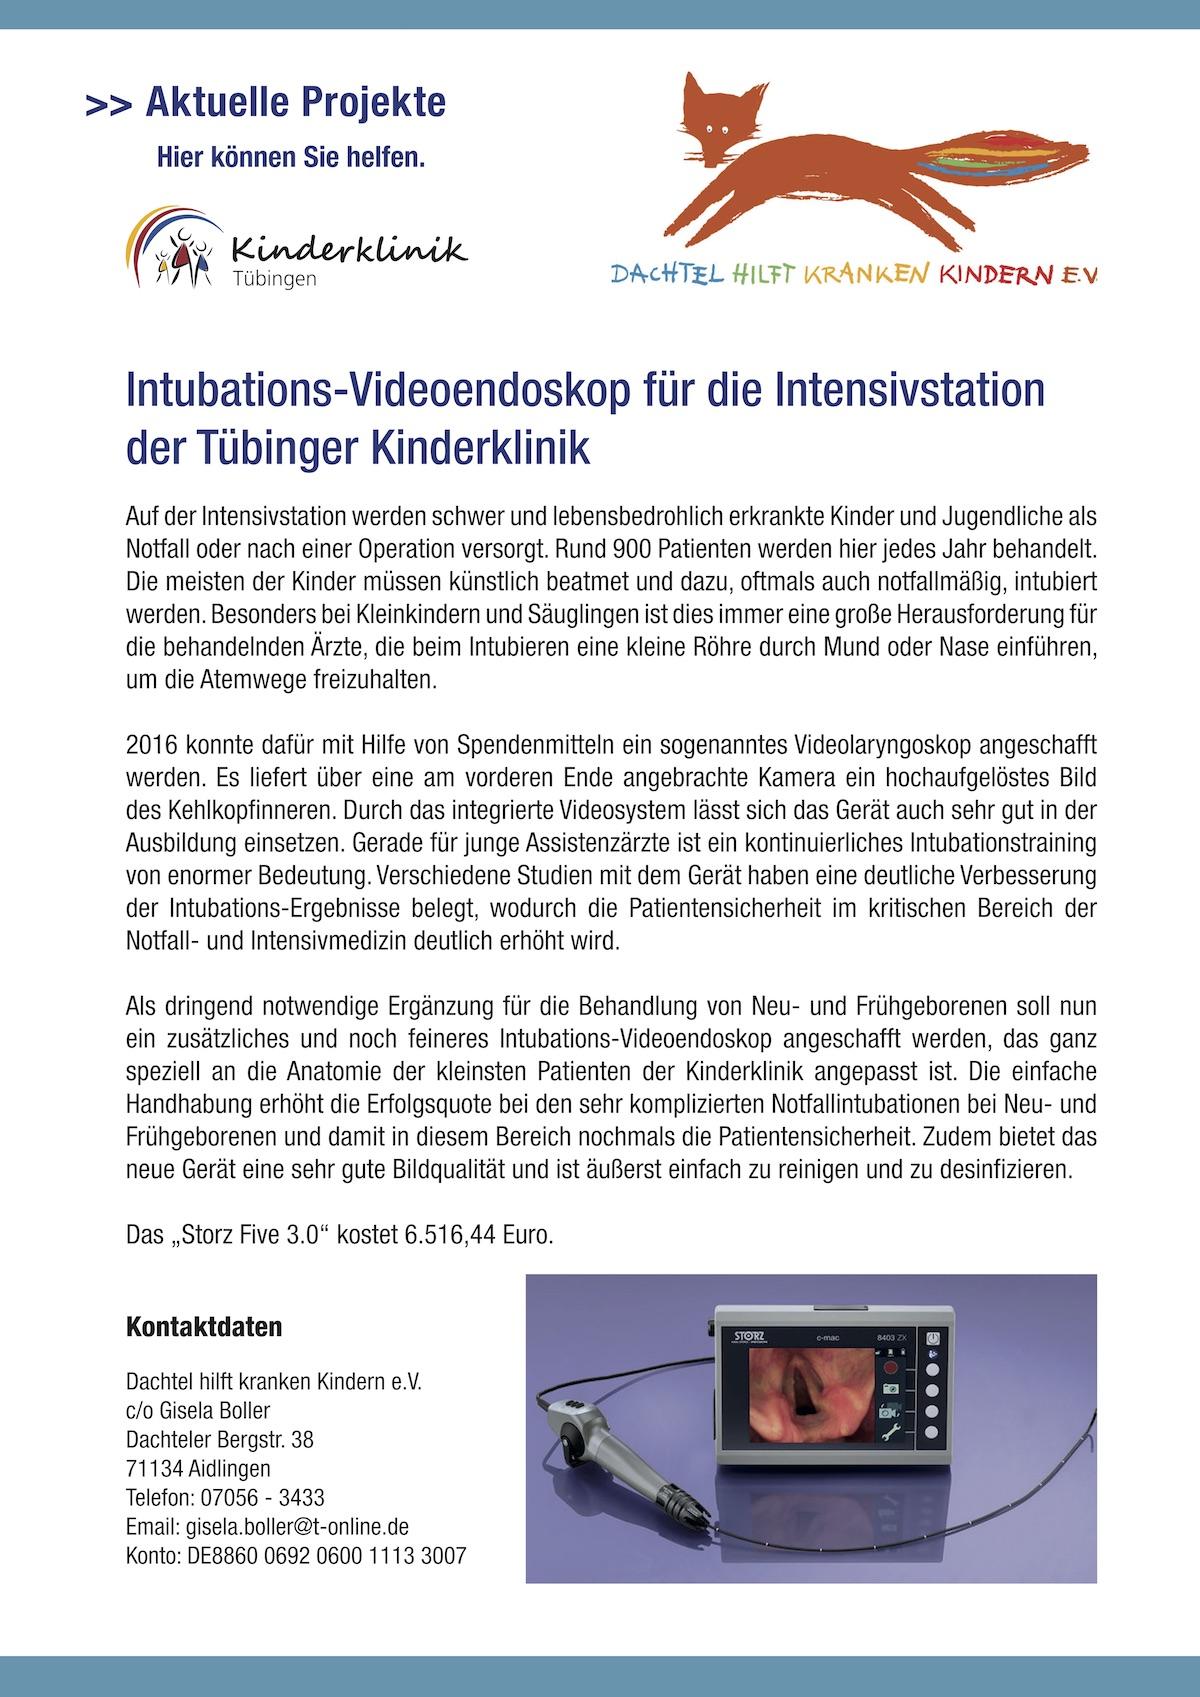 Intubations-Videoendoskop_Dachtel hilft kranken Kindern_2018